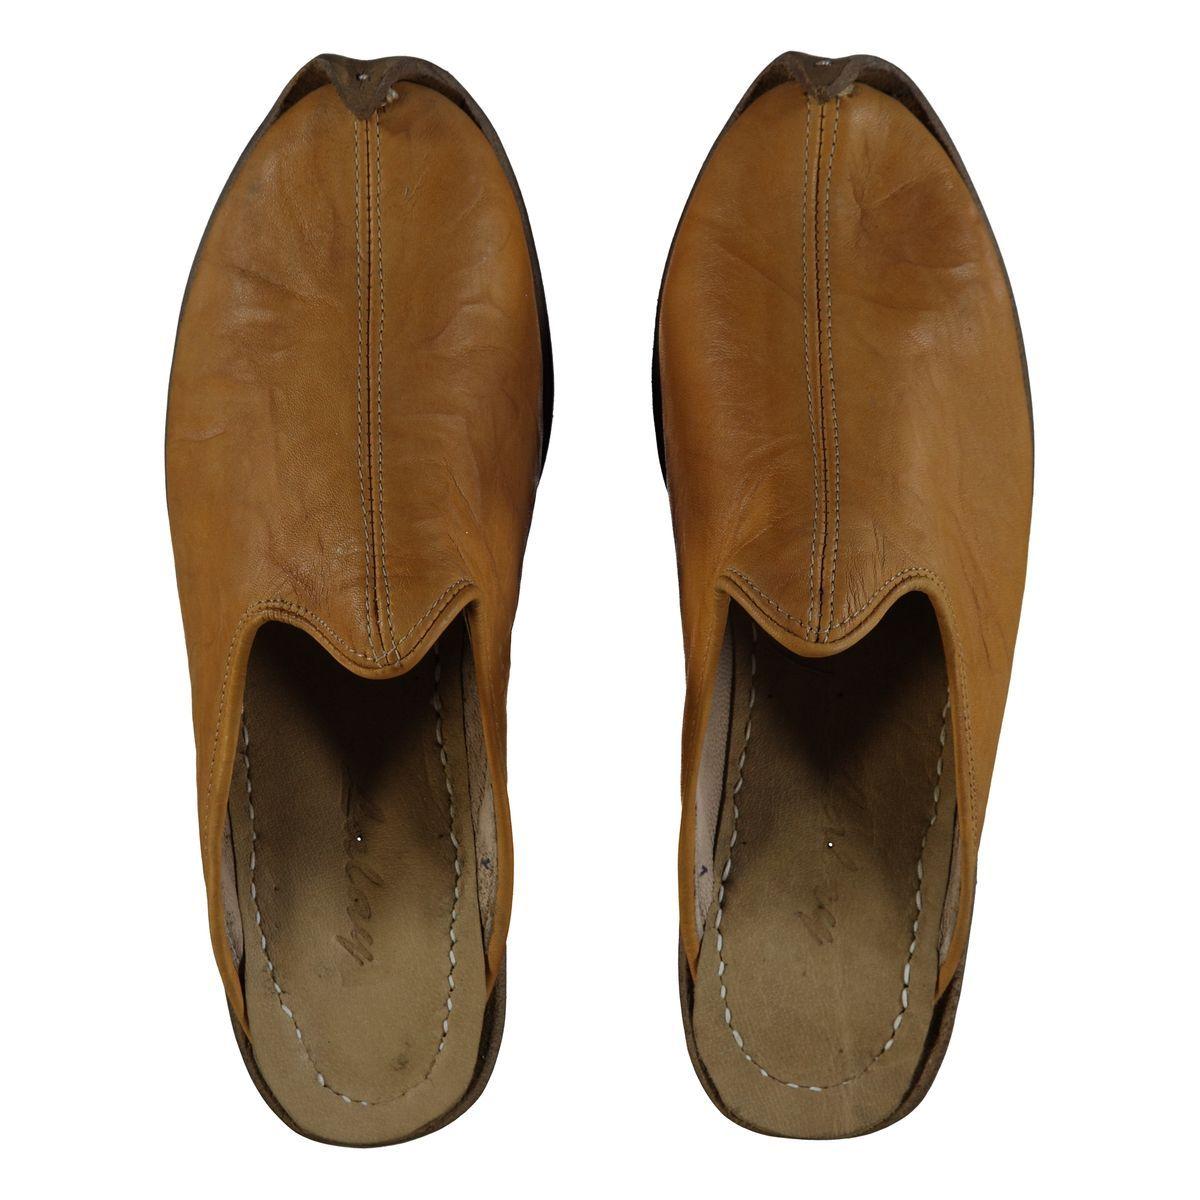 Slipper - Babouche - Leather / Handmade - Yellow